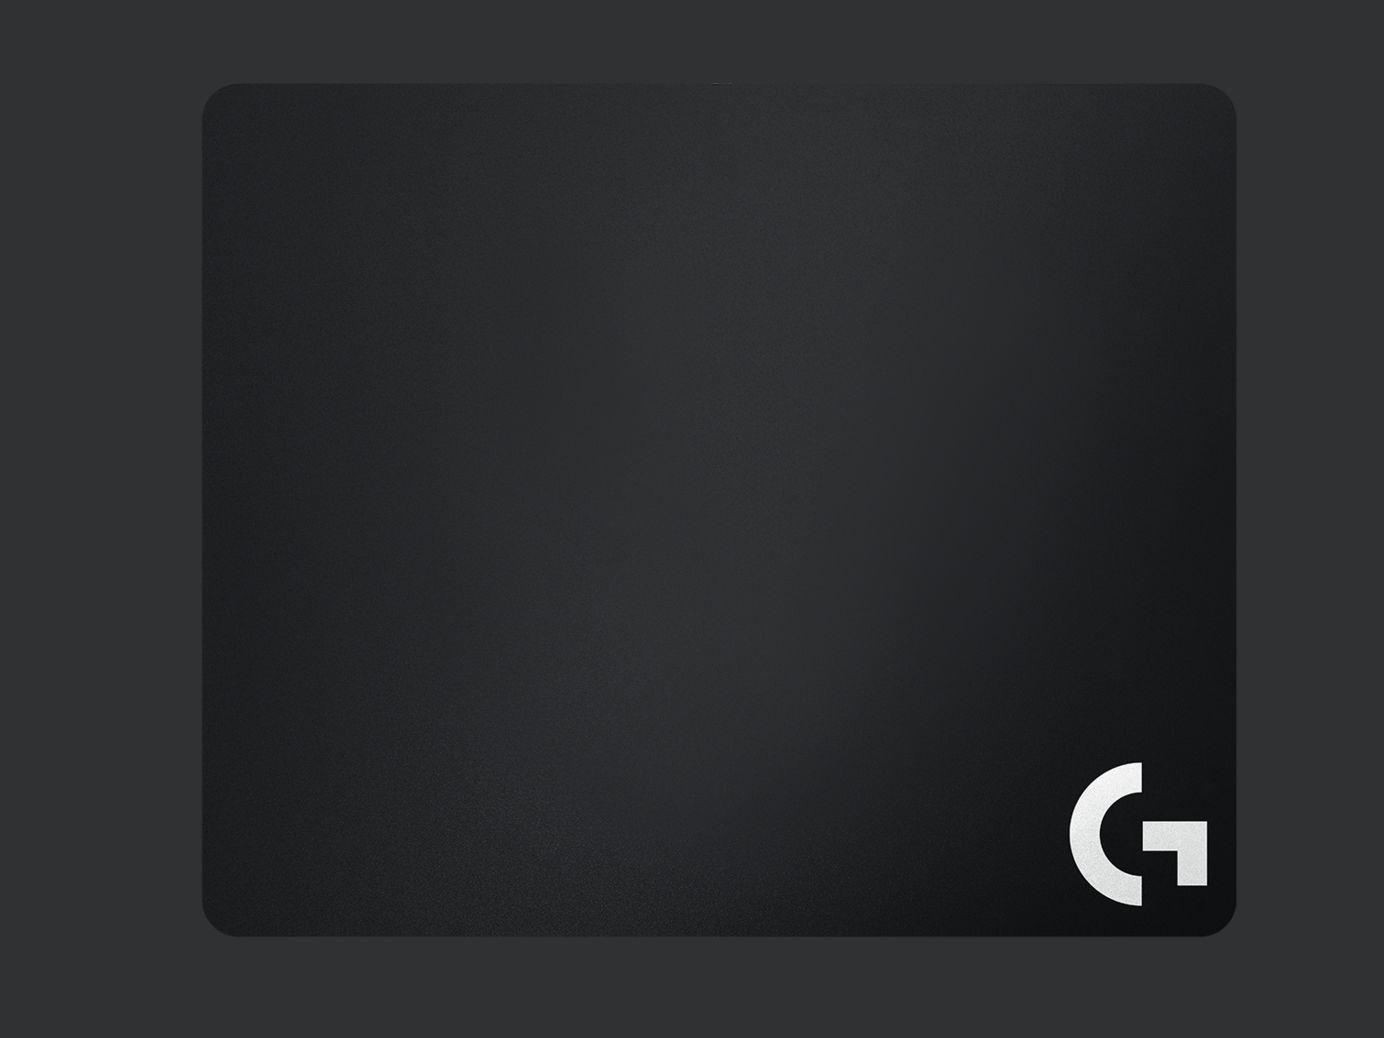 Mouse Pad Gamer G240 Logitech